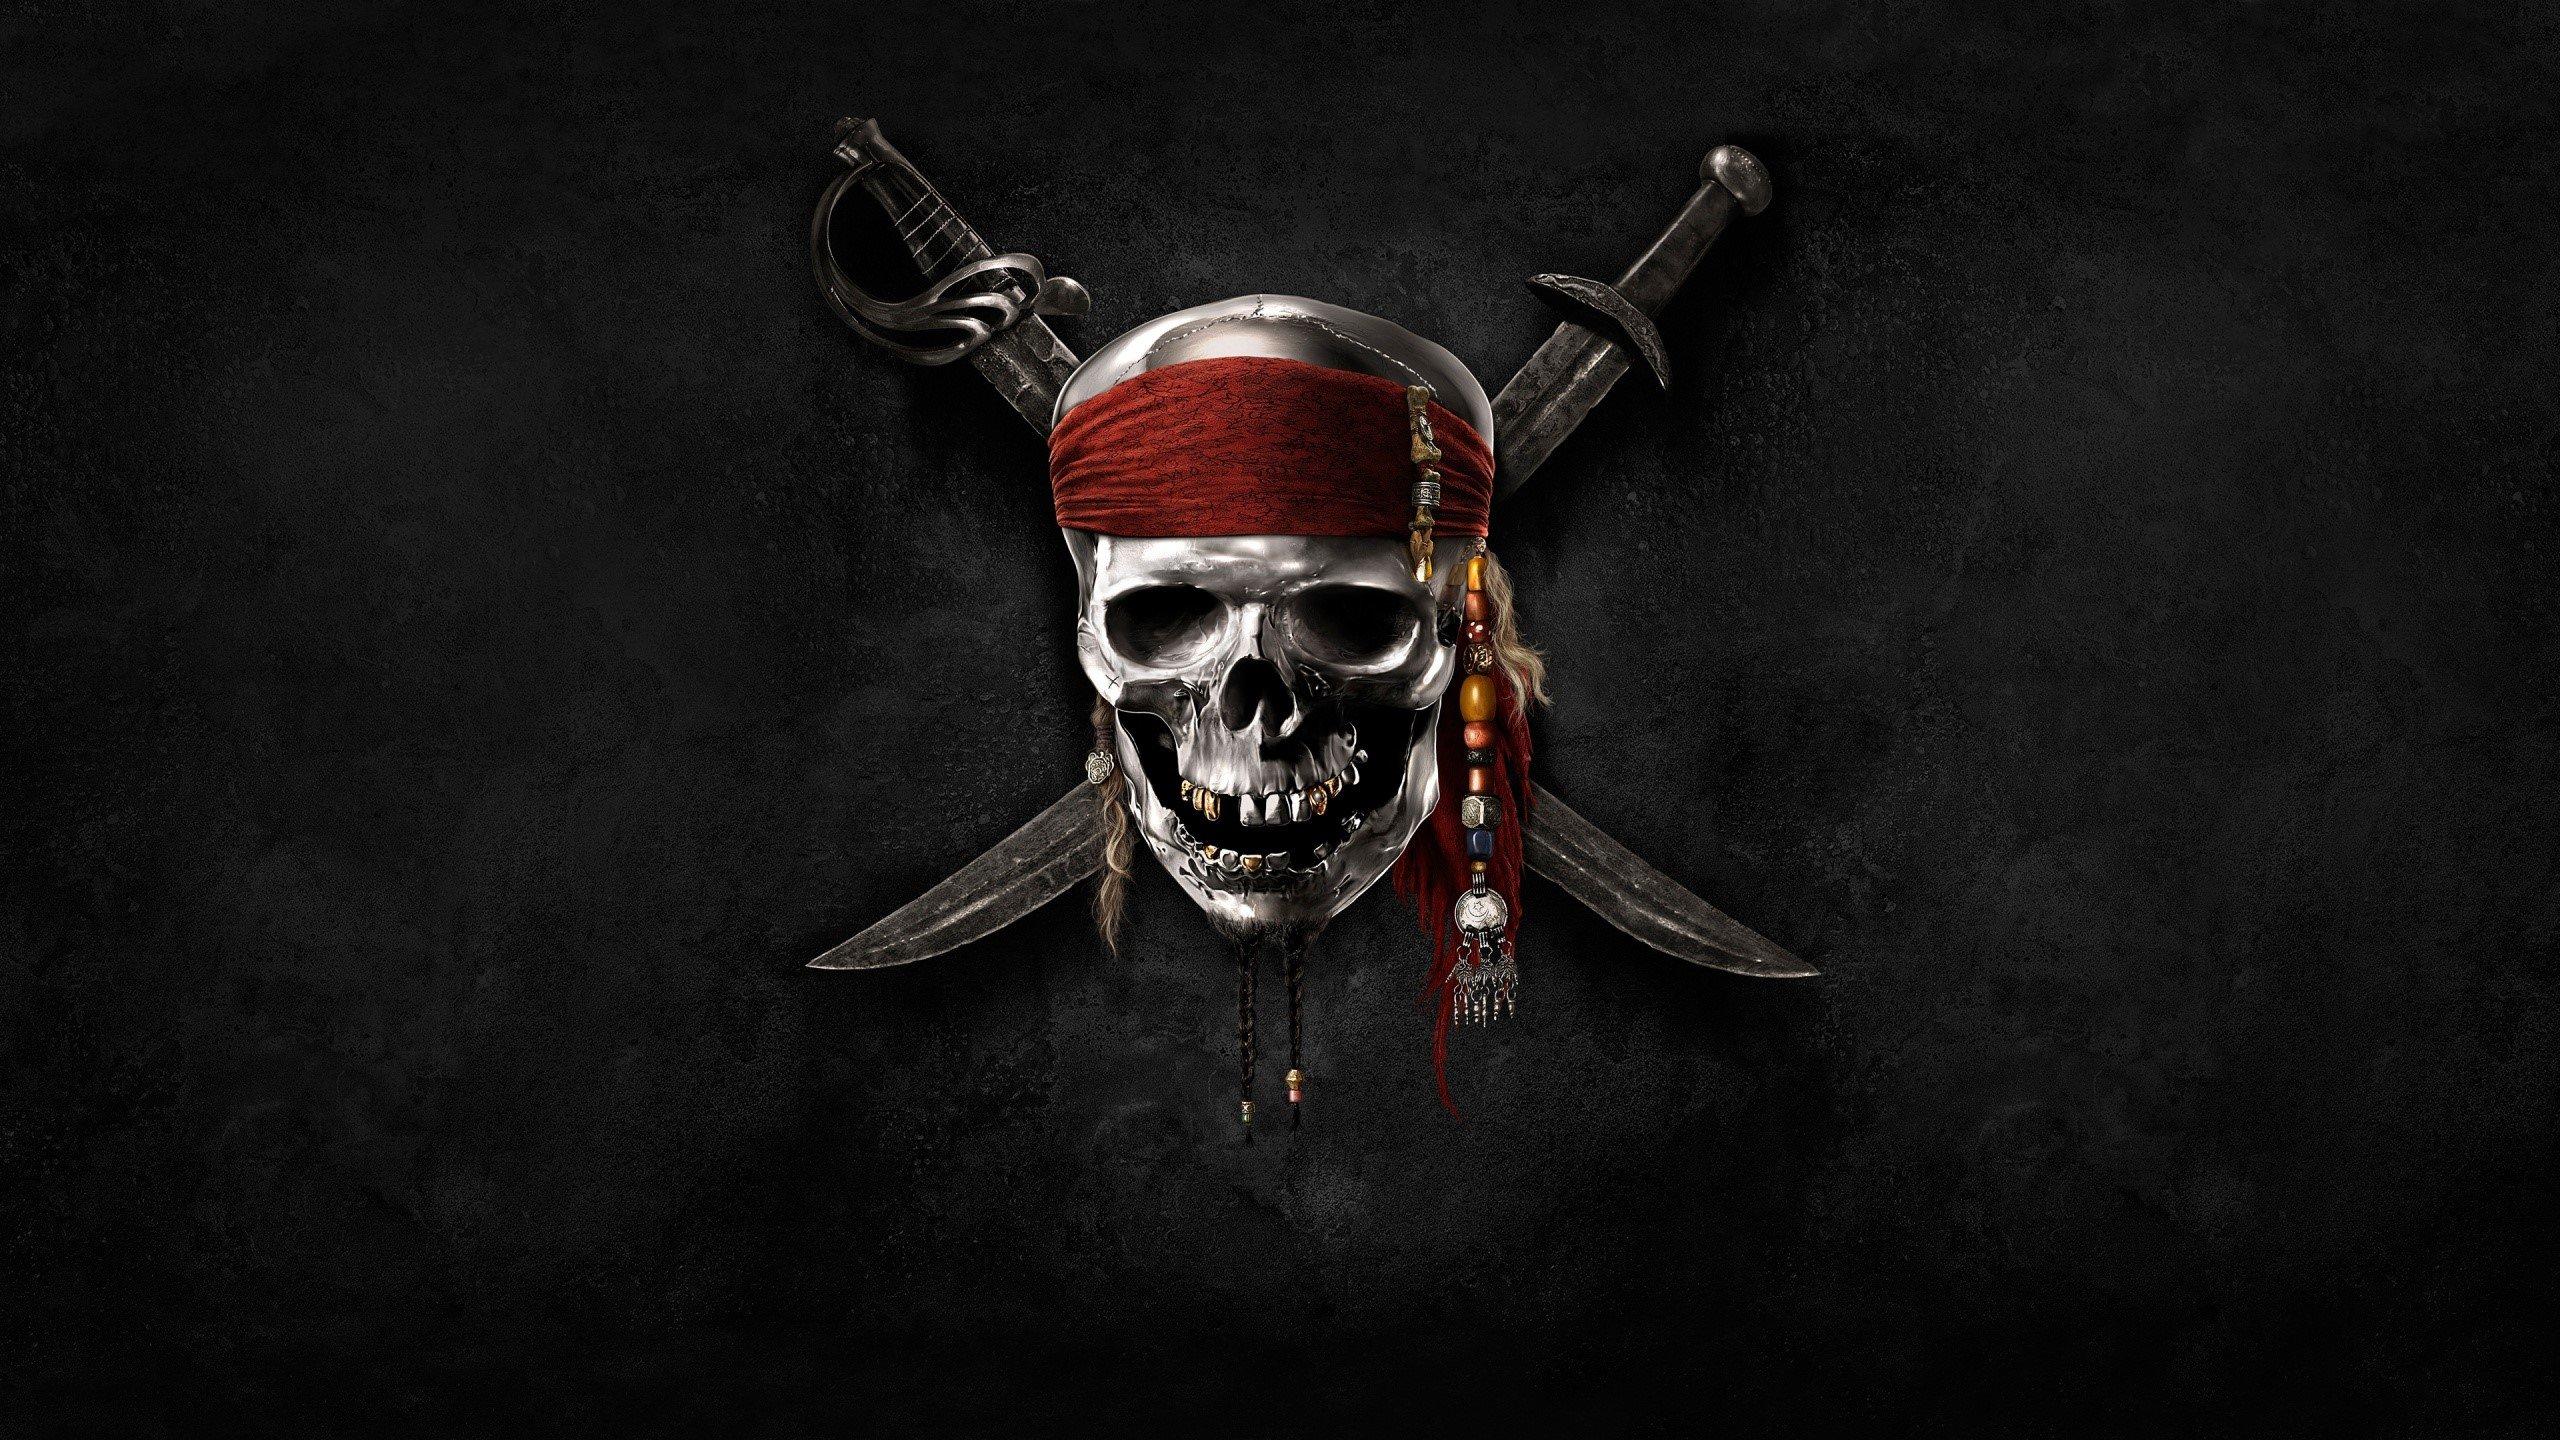 Fondo de pantalla de Pirata Imágenes